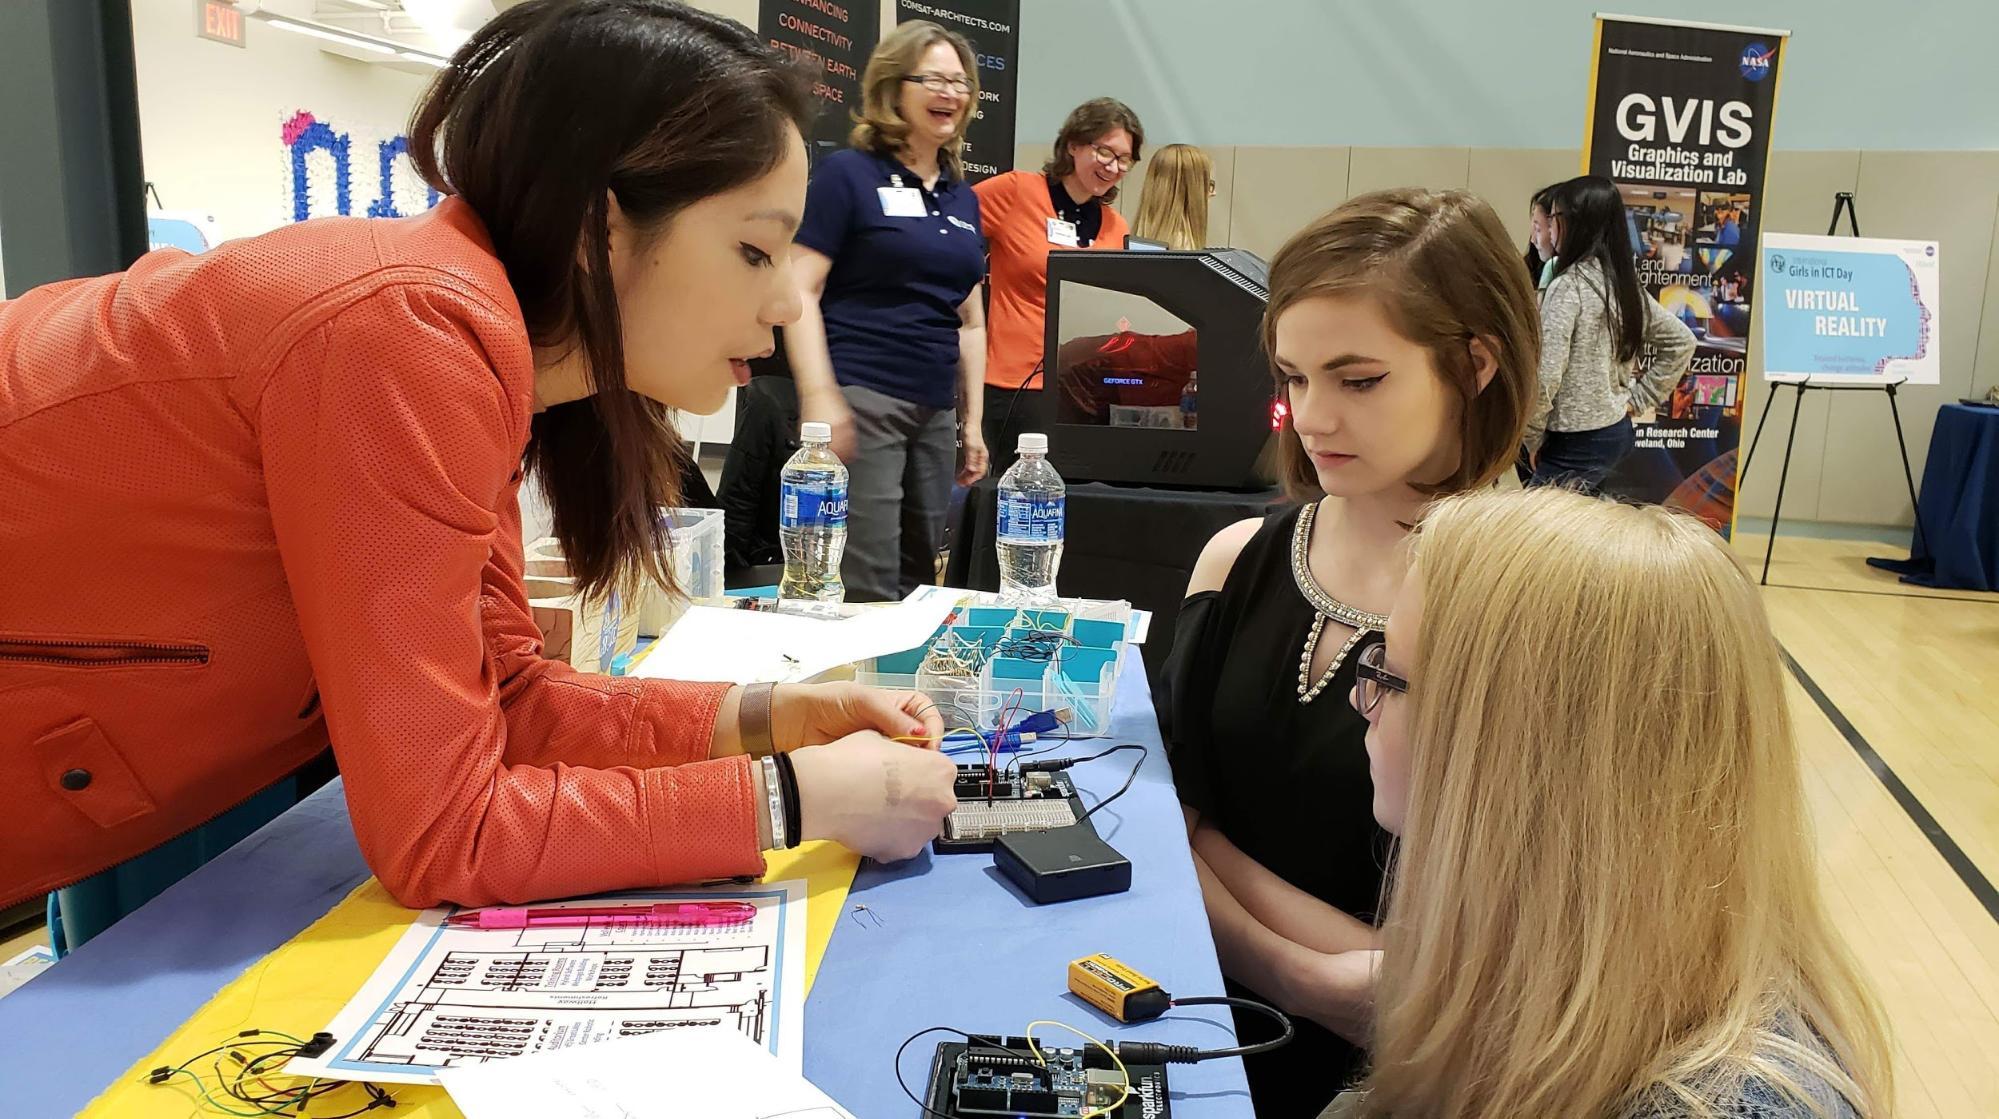 CES 2019: Startup Gadgets at Eureka Park - TidBITS